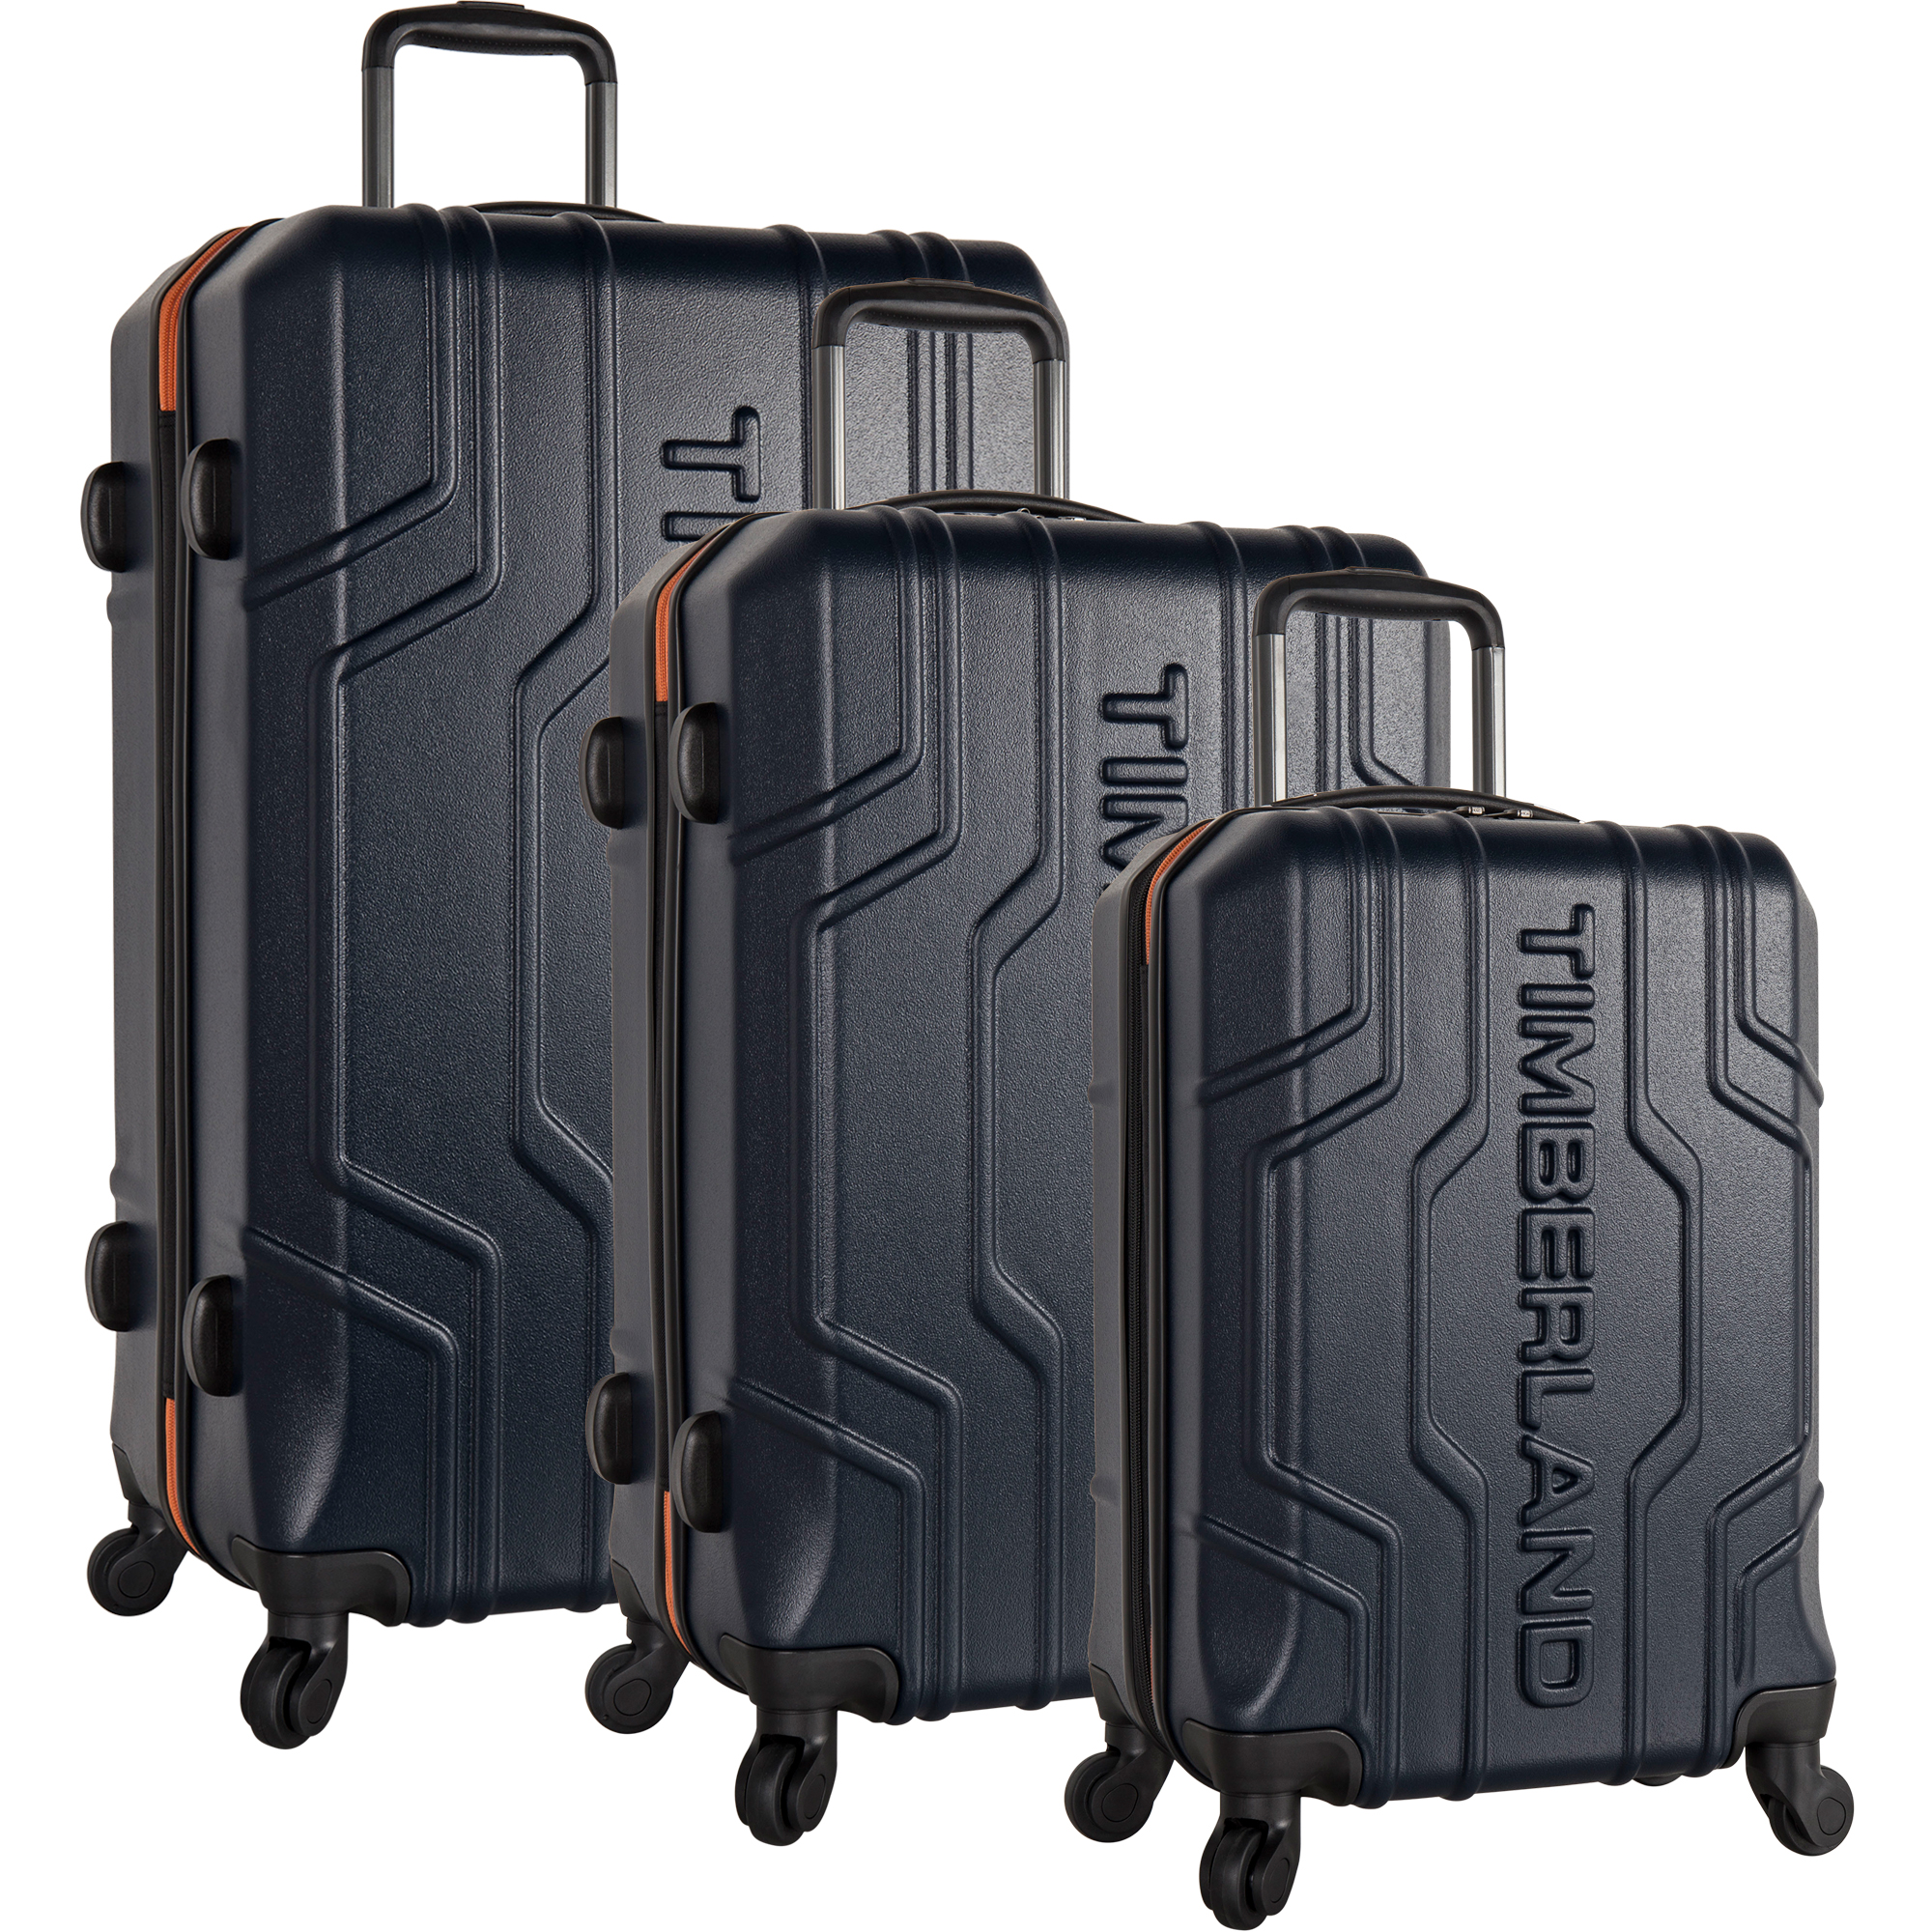 Timberland Alpine Trail 3 Piece Hardside Spinner Luggage Set